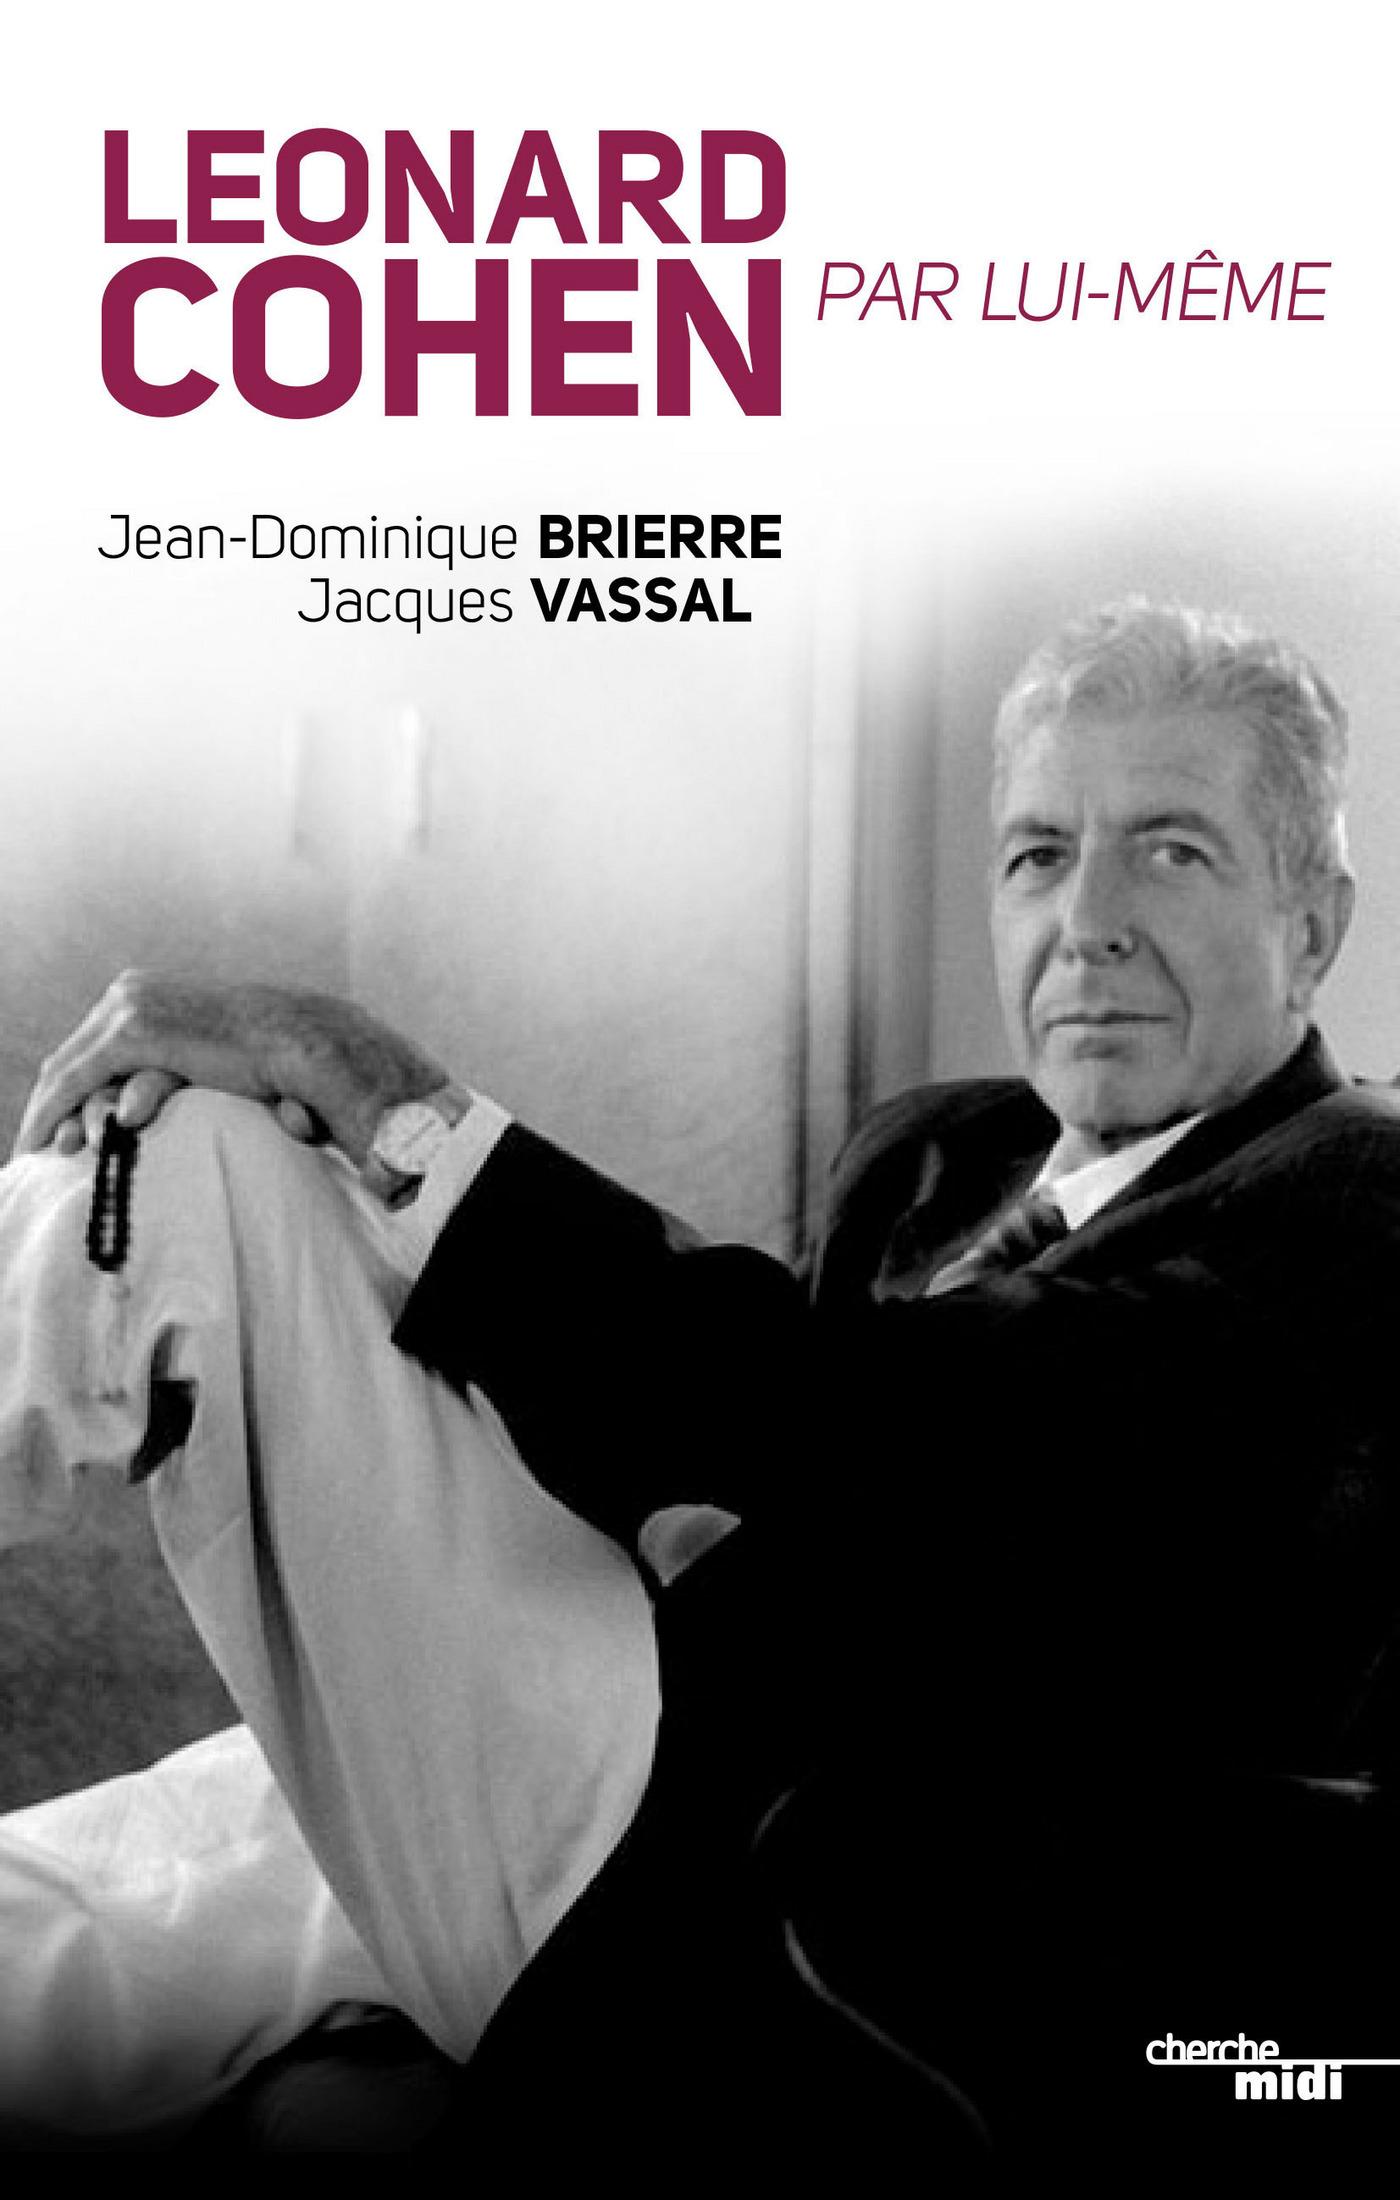 Leonard Cohen par lui-même (ebook)